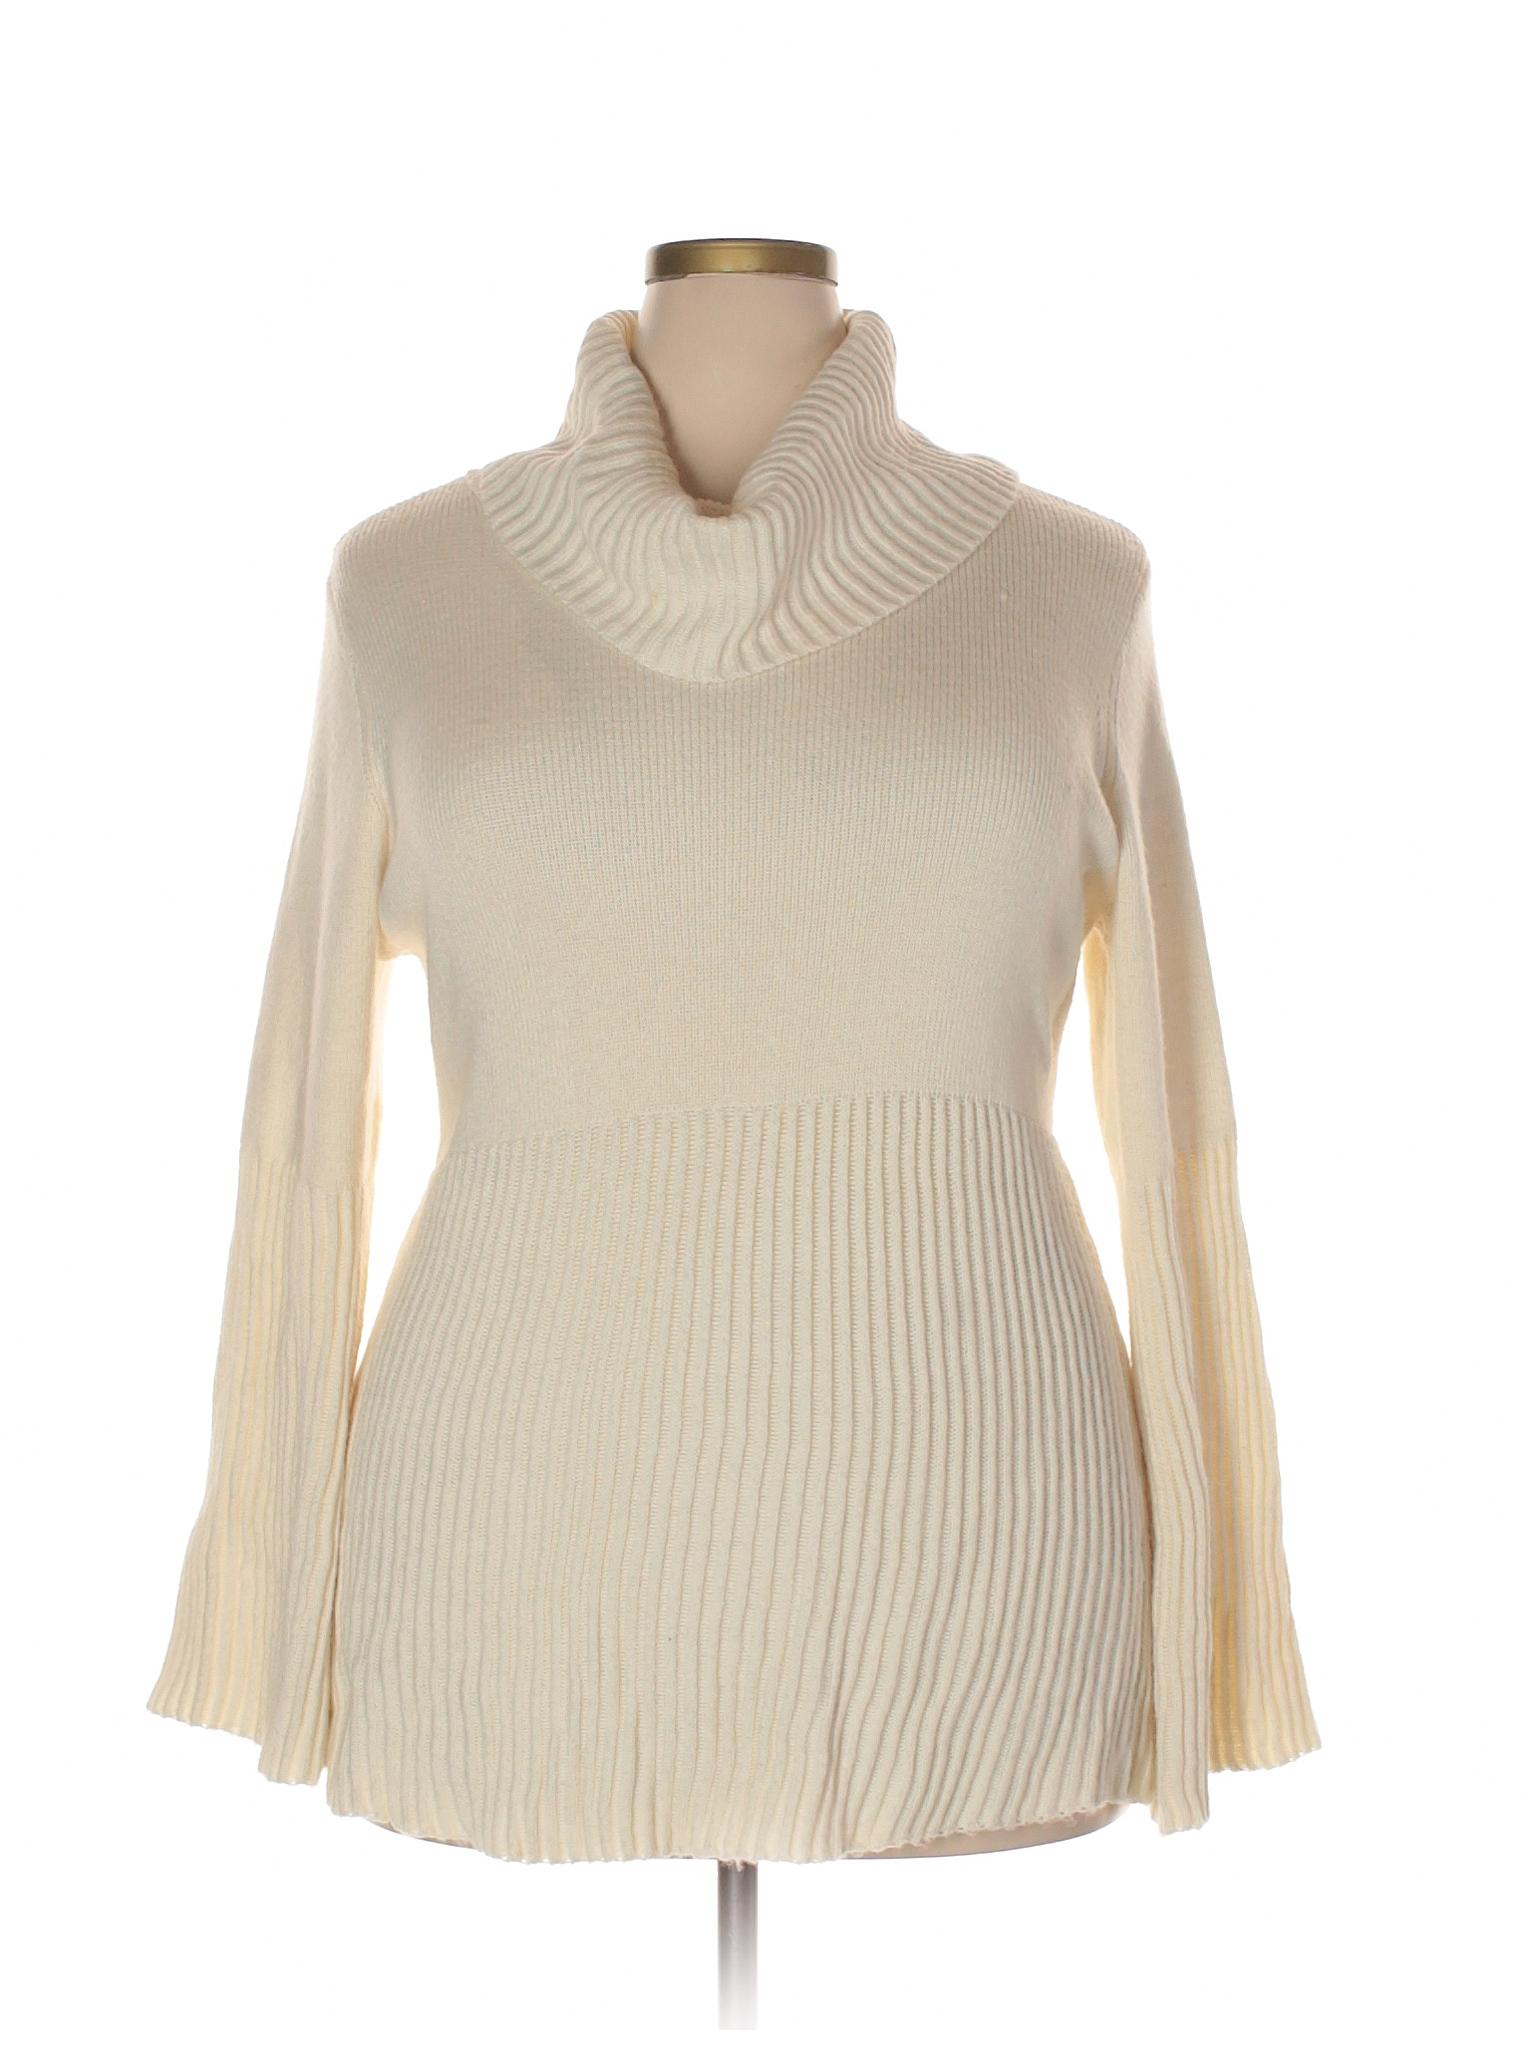 Turtleneck Style Turtleneck Style Boutique Sweater Boutique amp;Co amp;Co Sweater Boutique xaqg881n